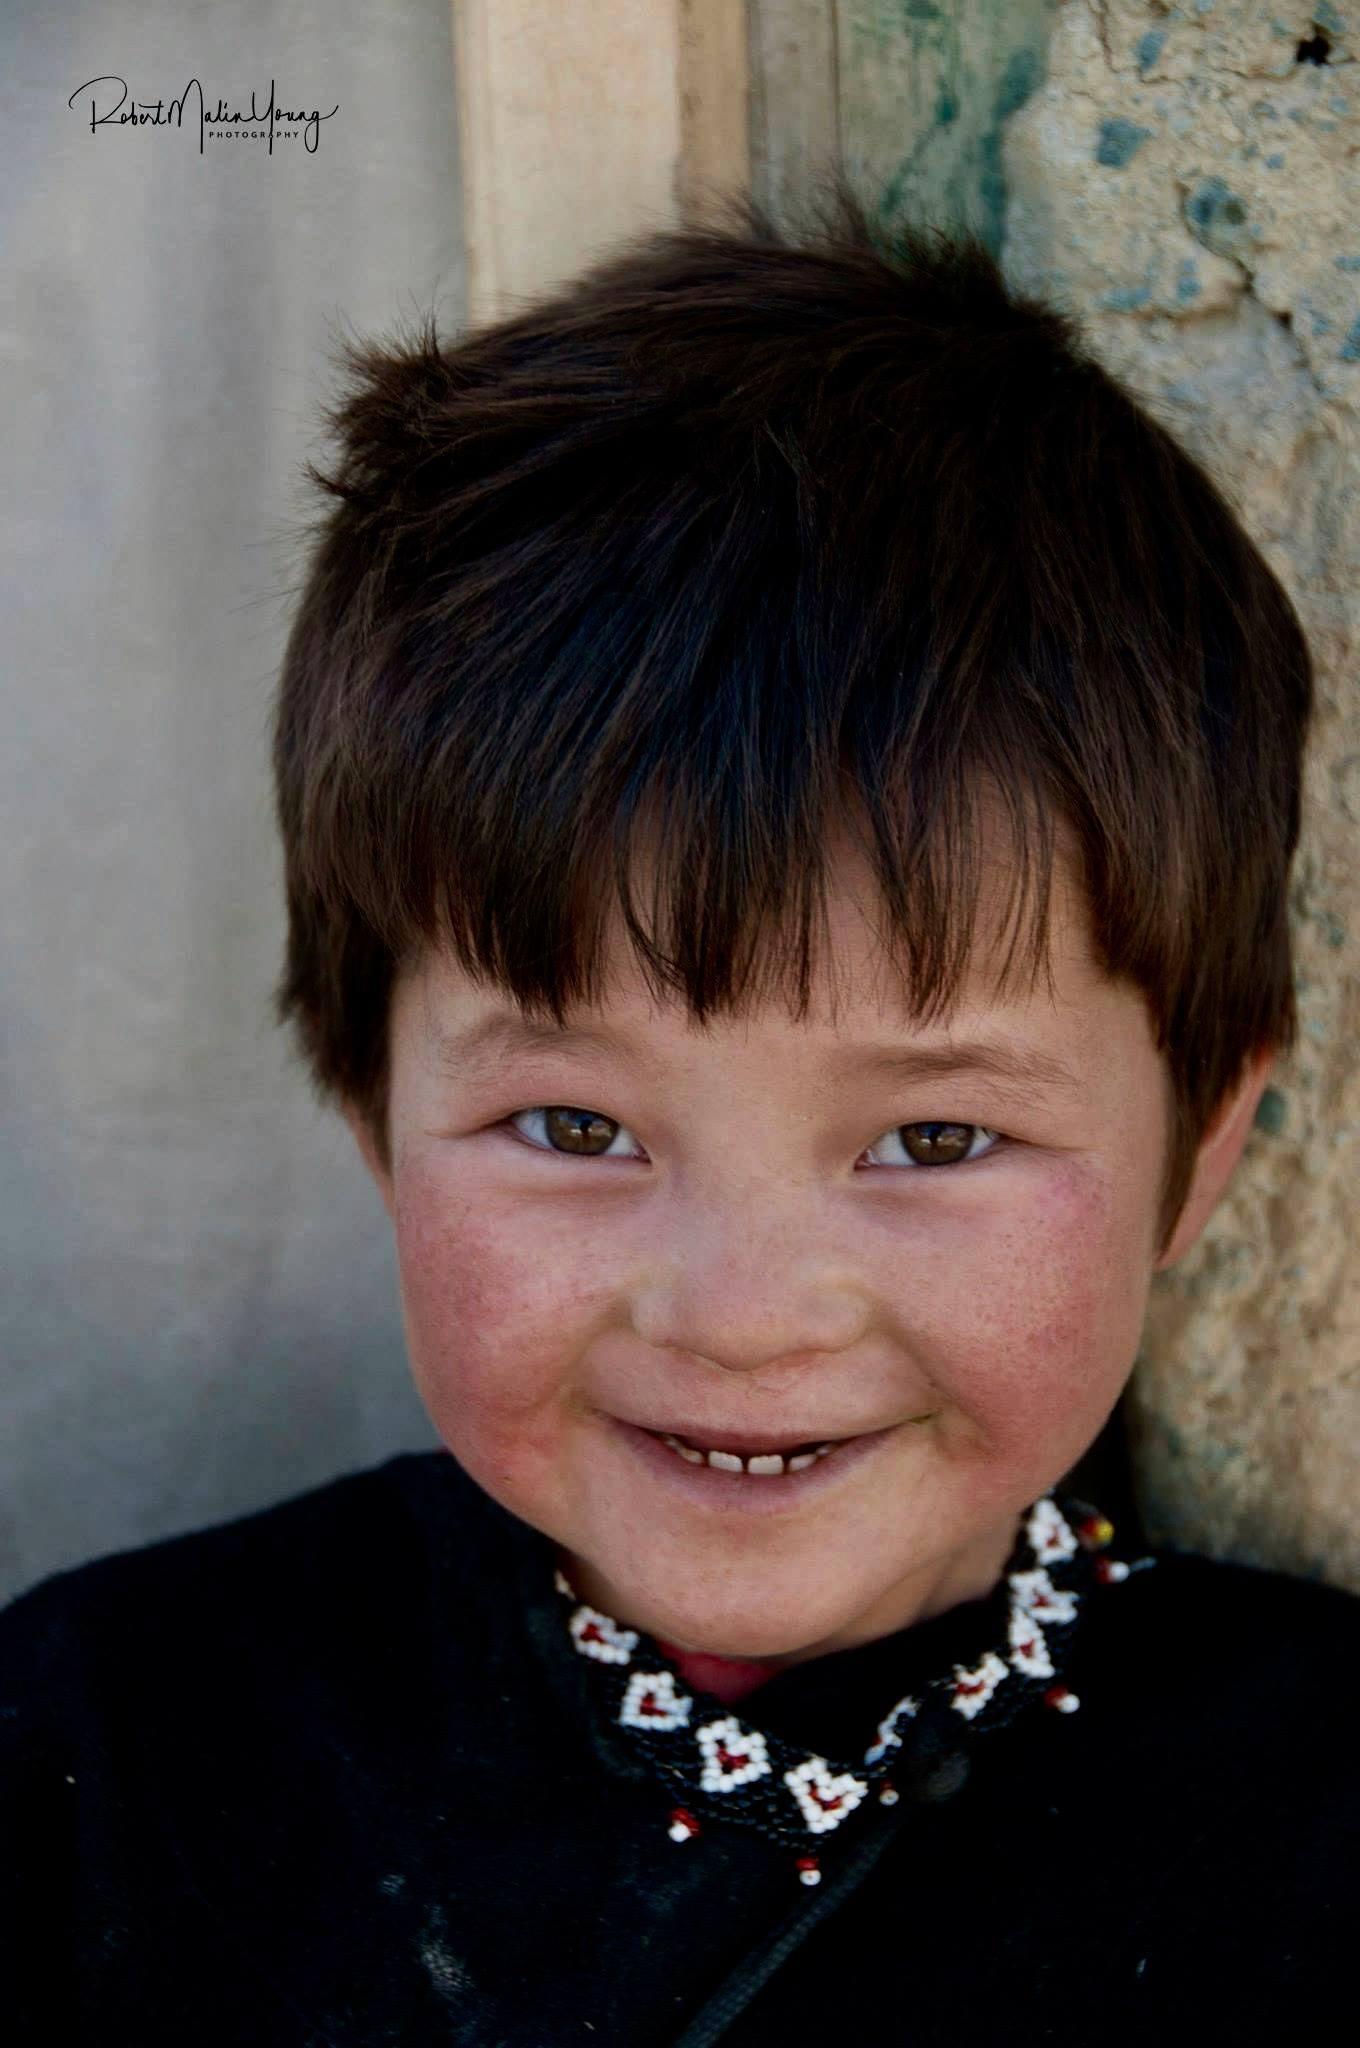 Young Hazari  boy - Afghanistan 2018 by Robert Malin Young